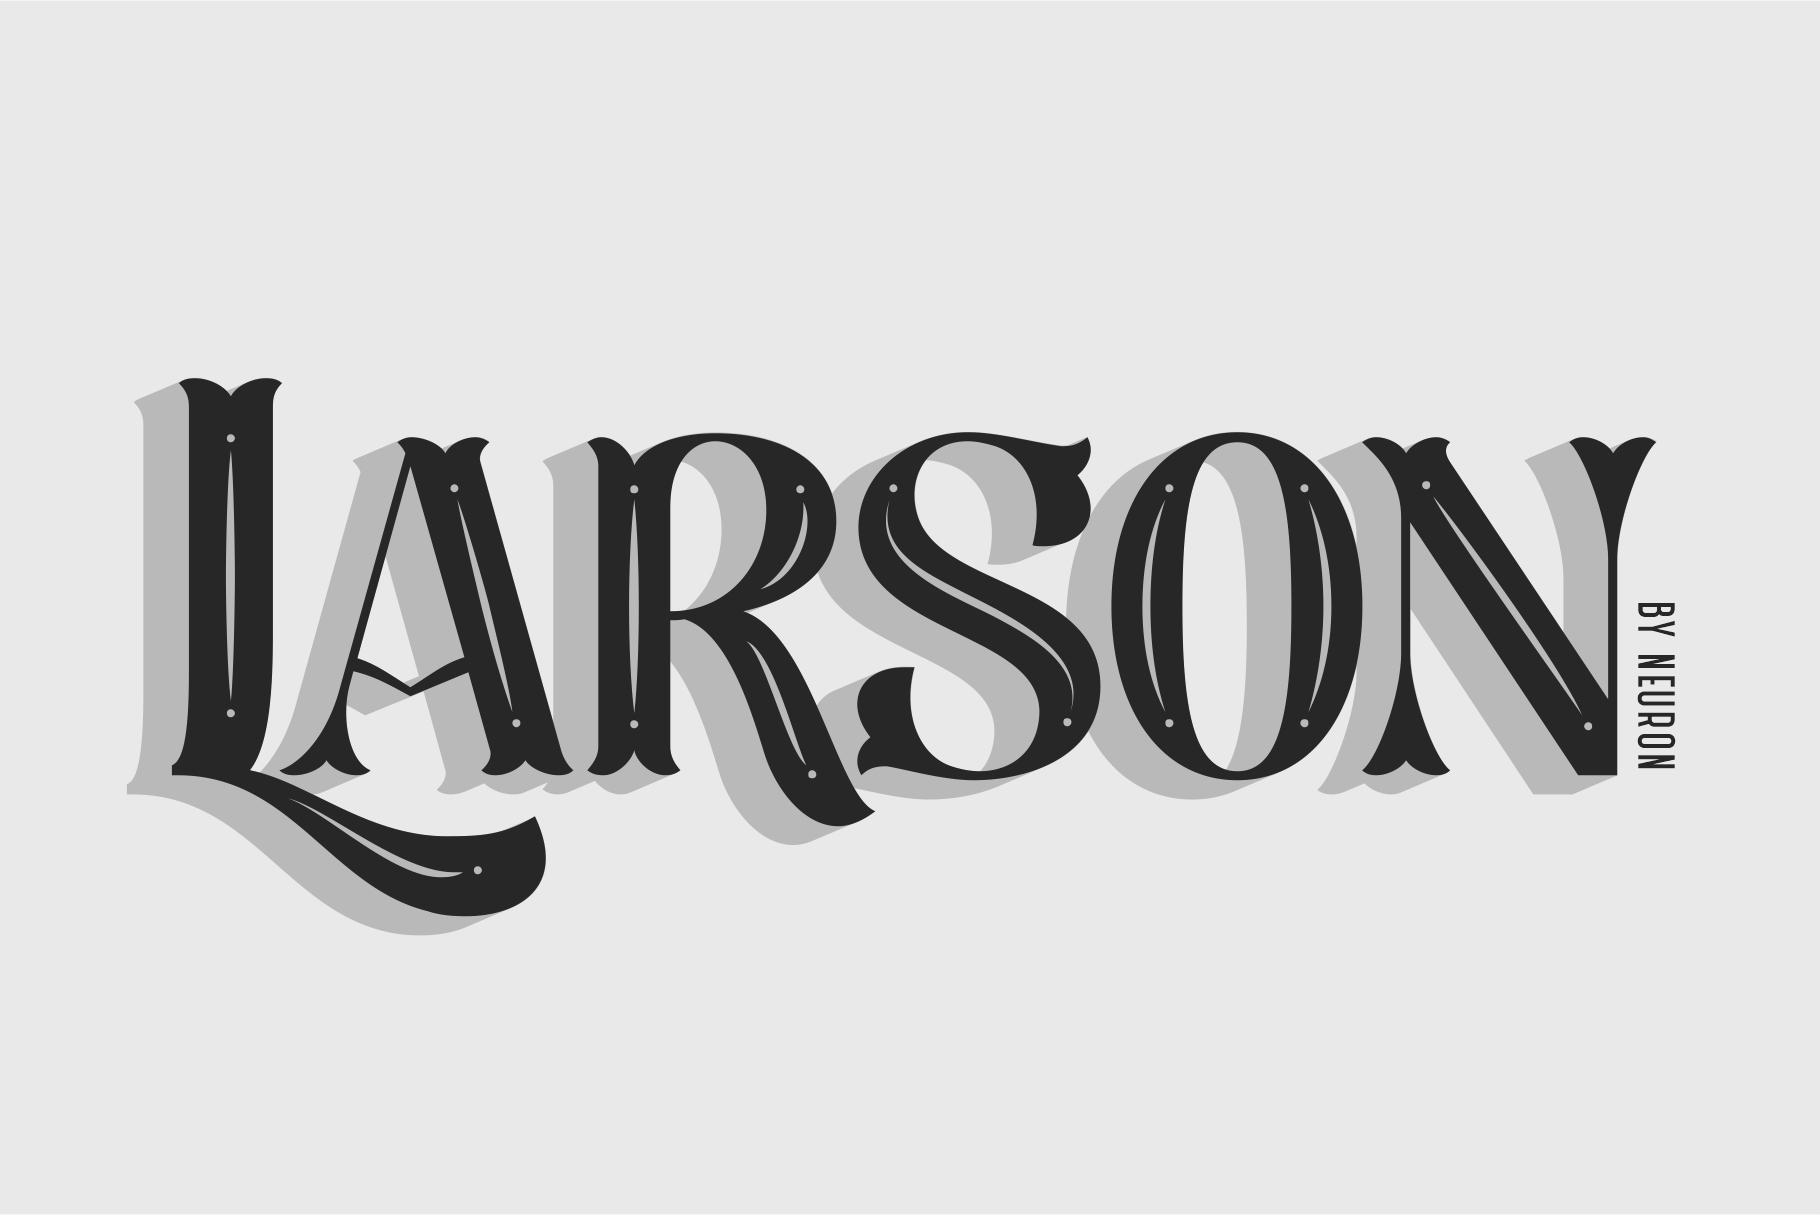 Larson Display Font example image 2